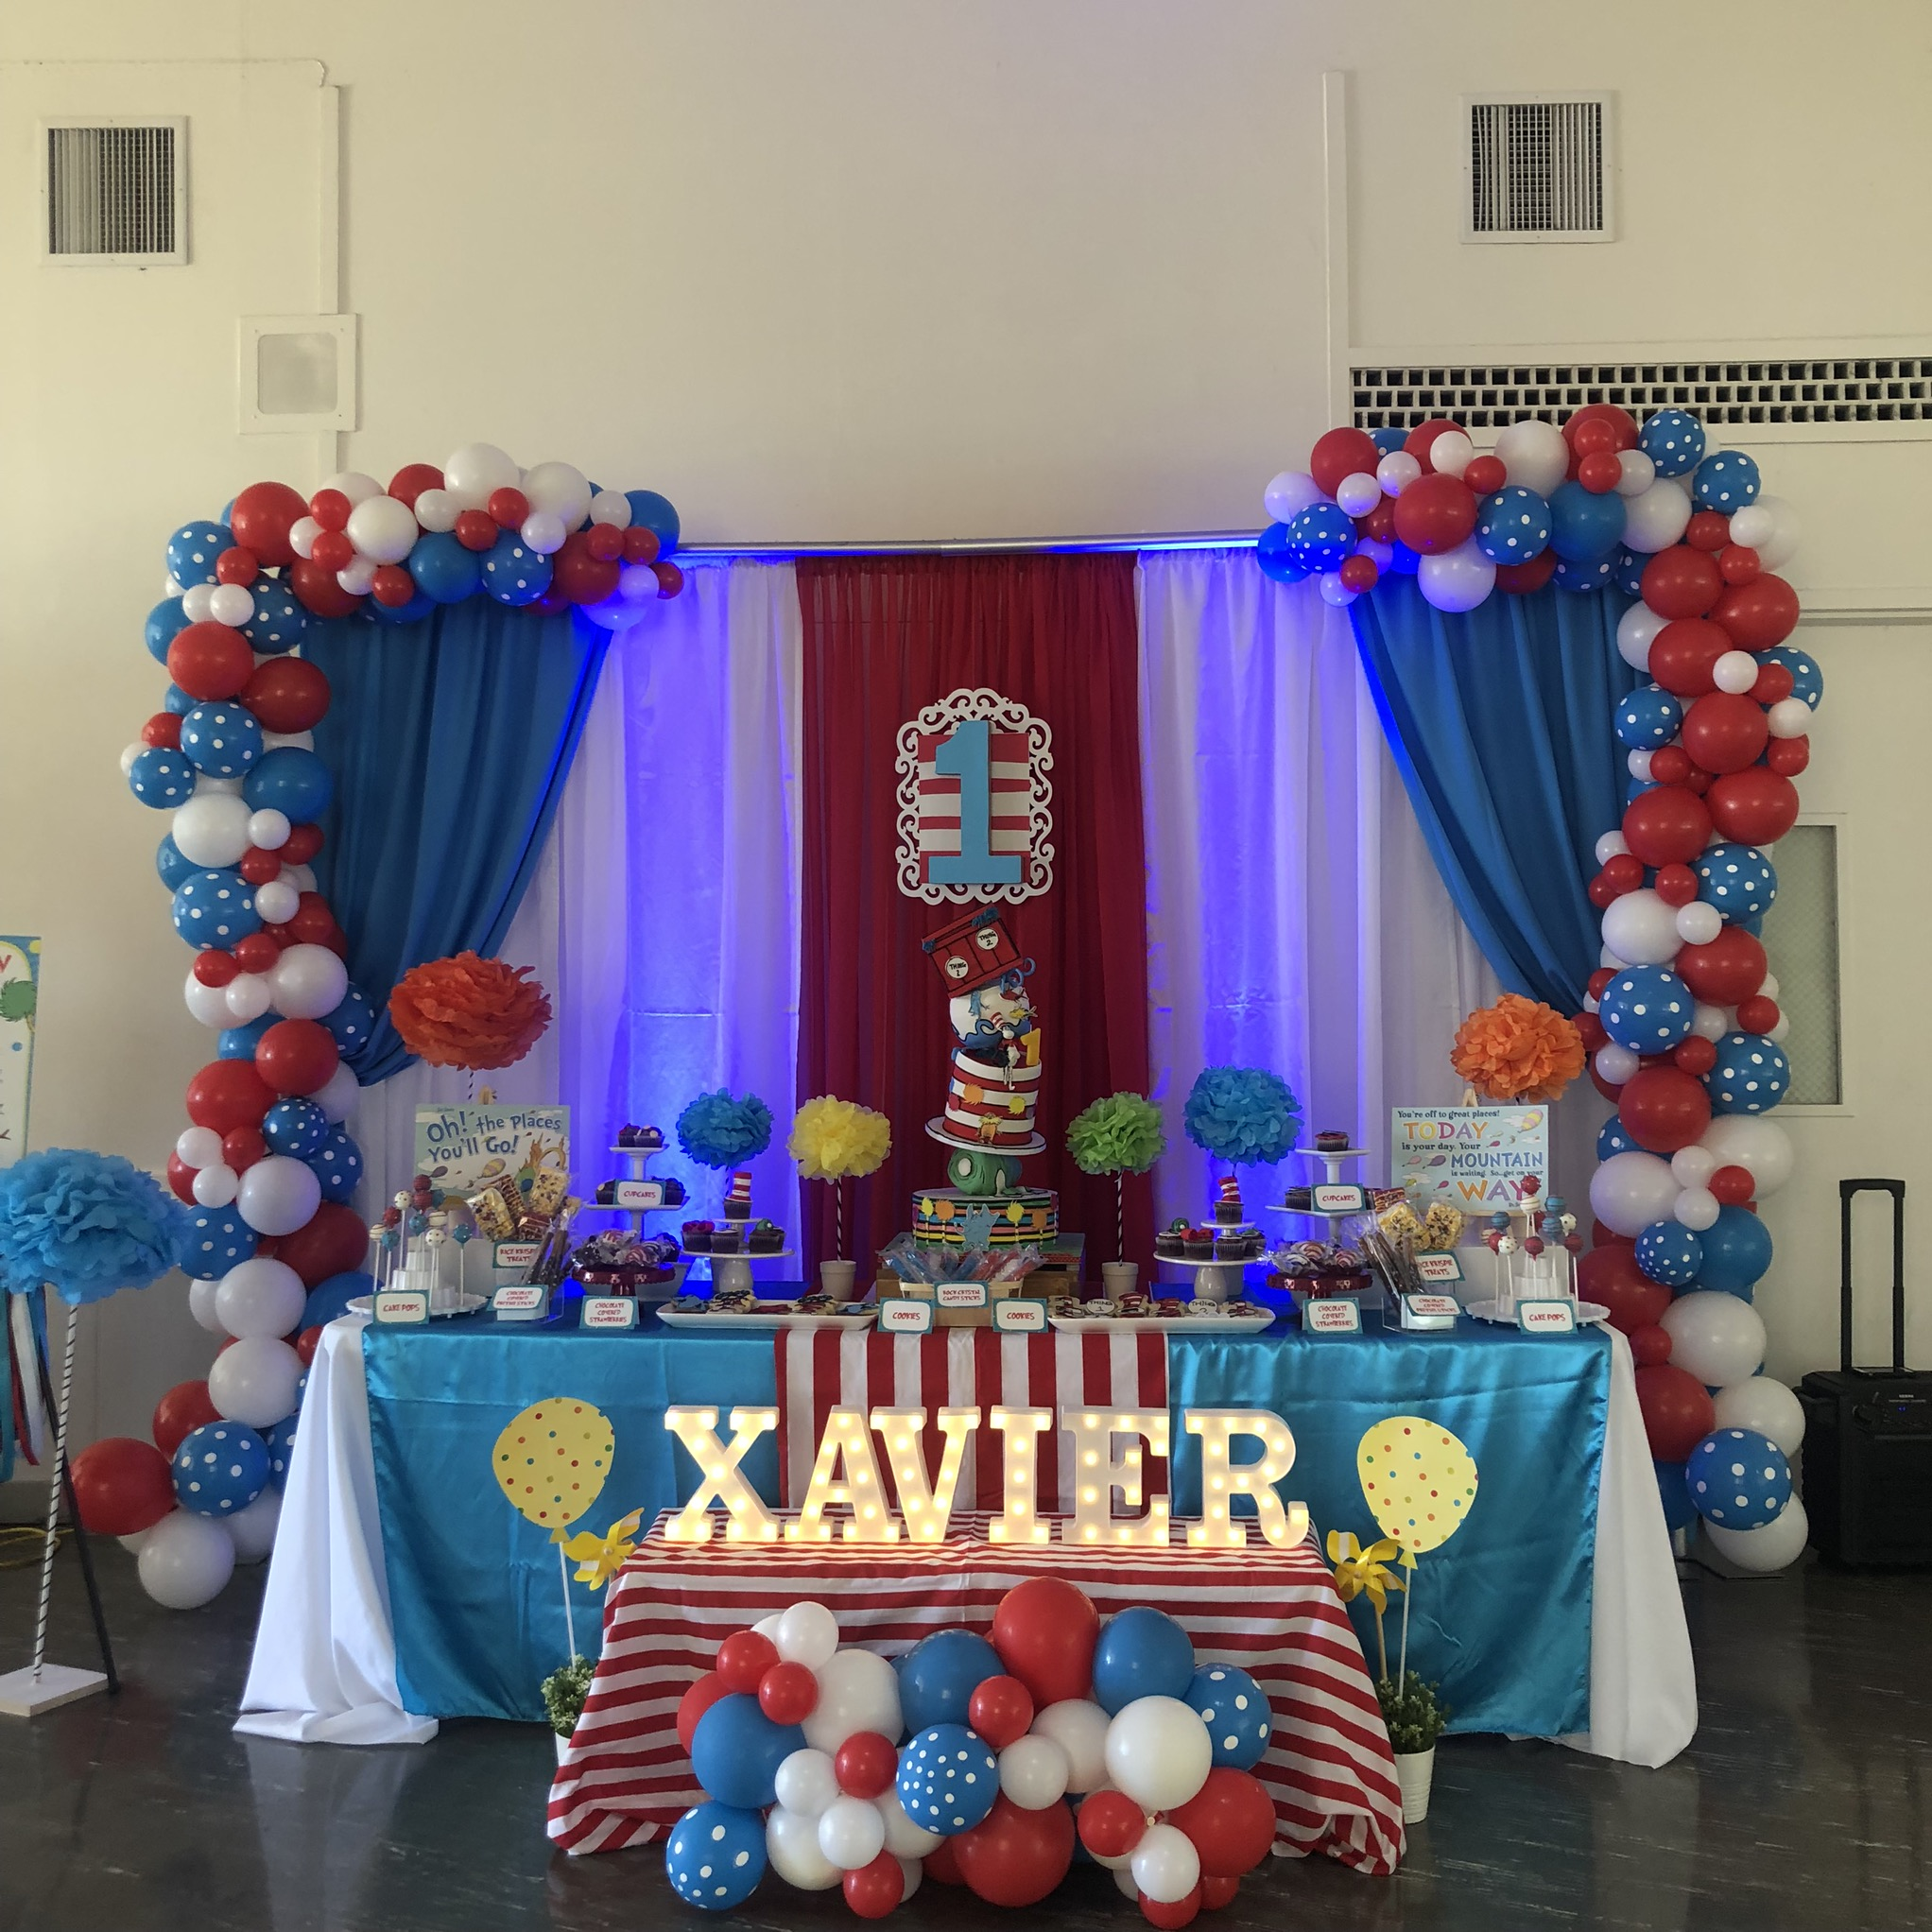 Sarsie's Parties 06-08-19 Dr. Seuss Birthday Party